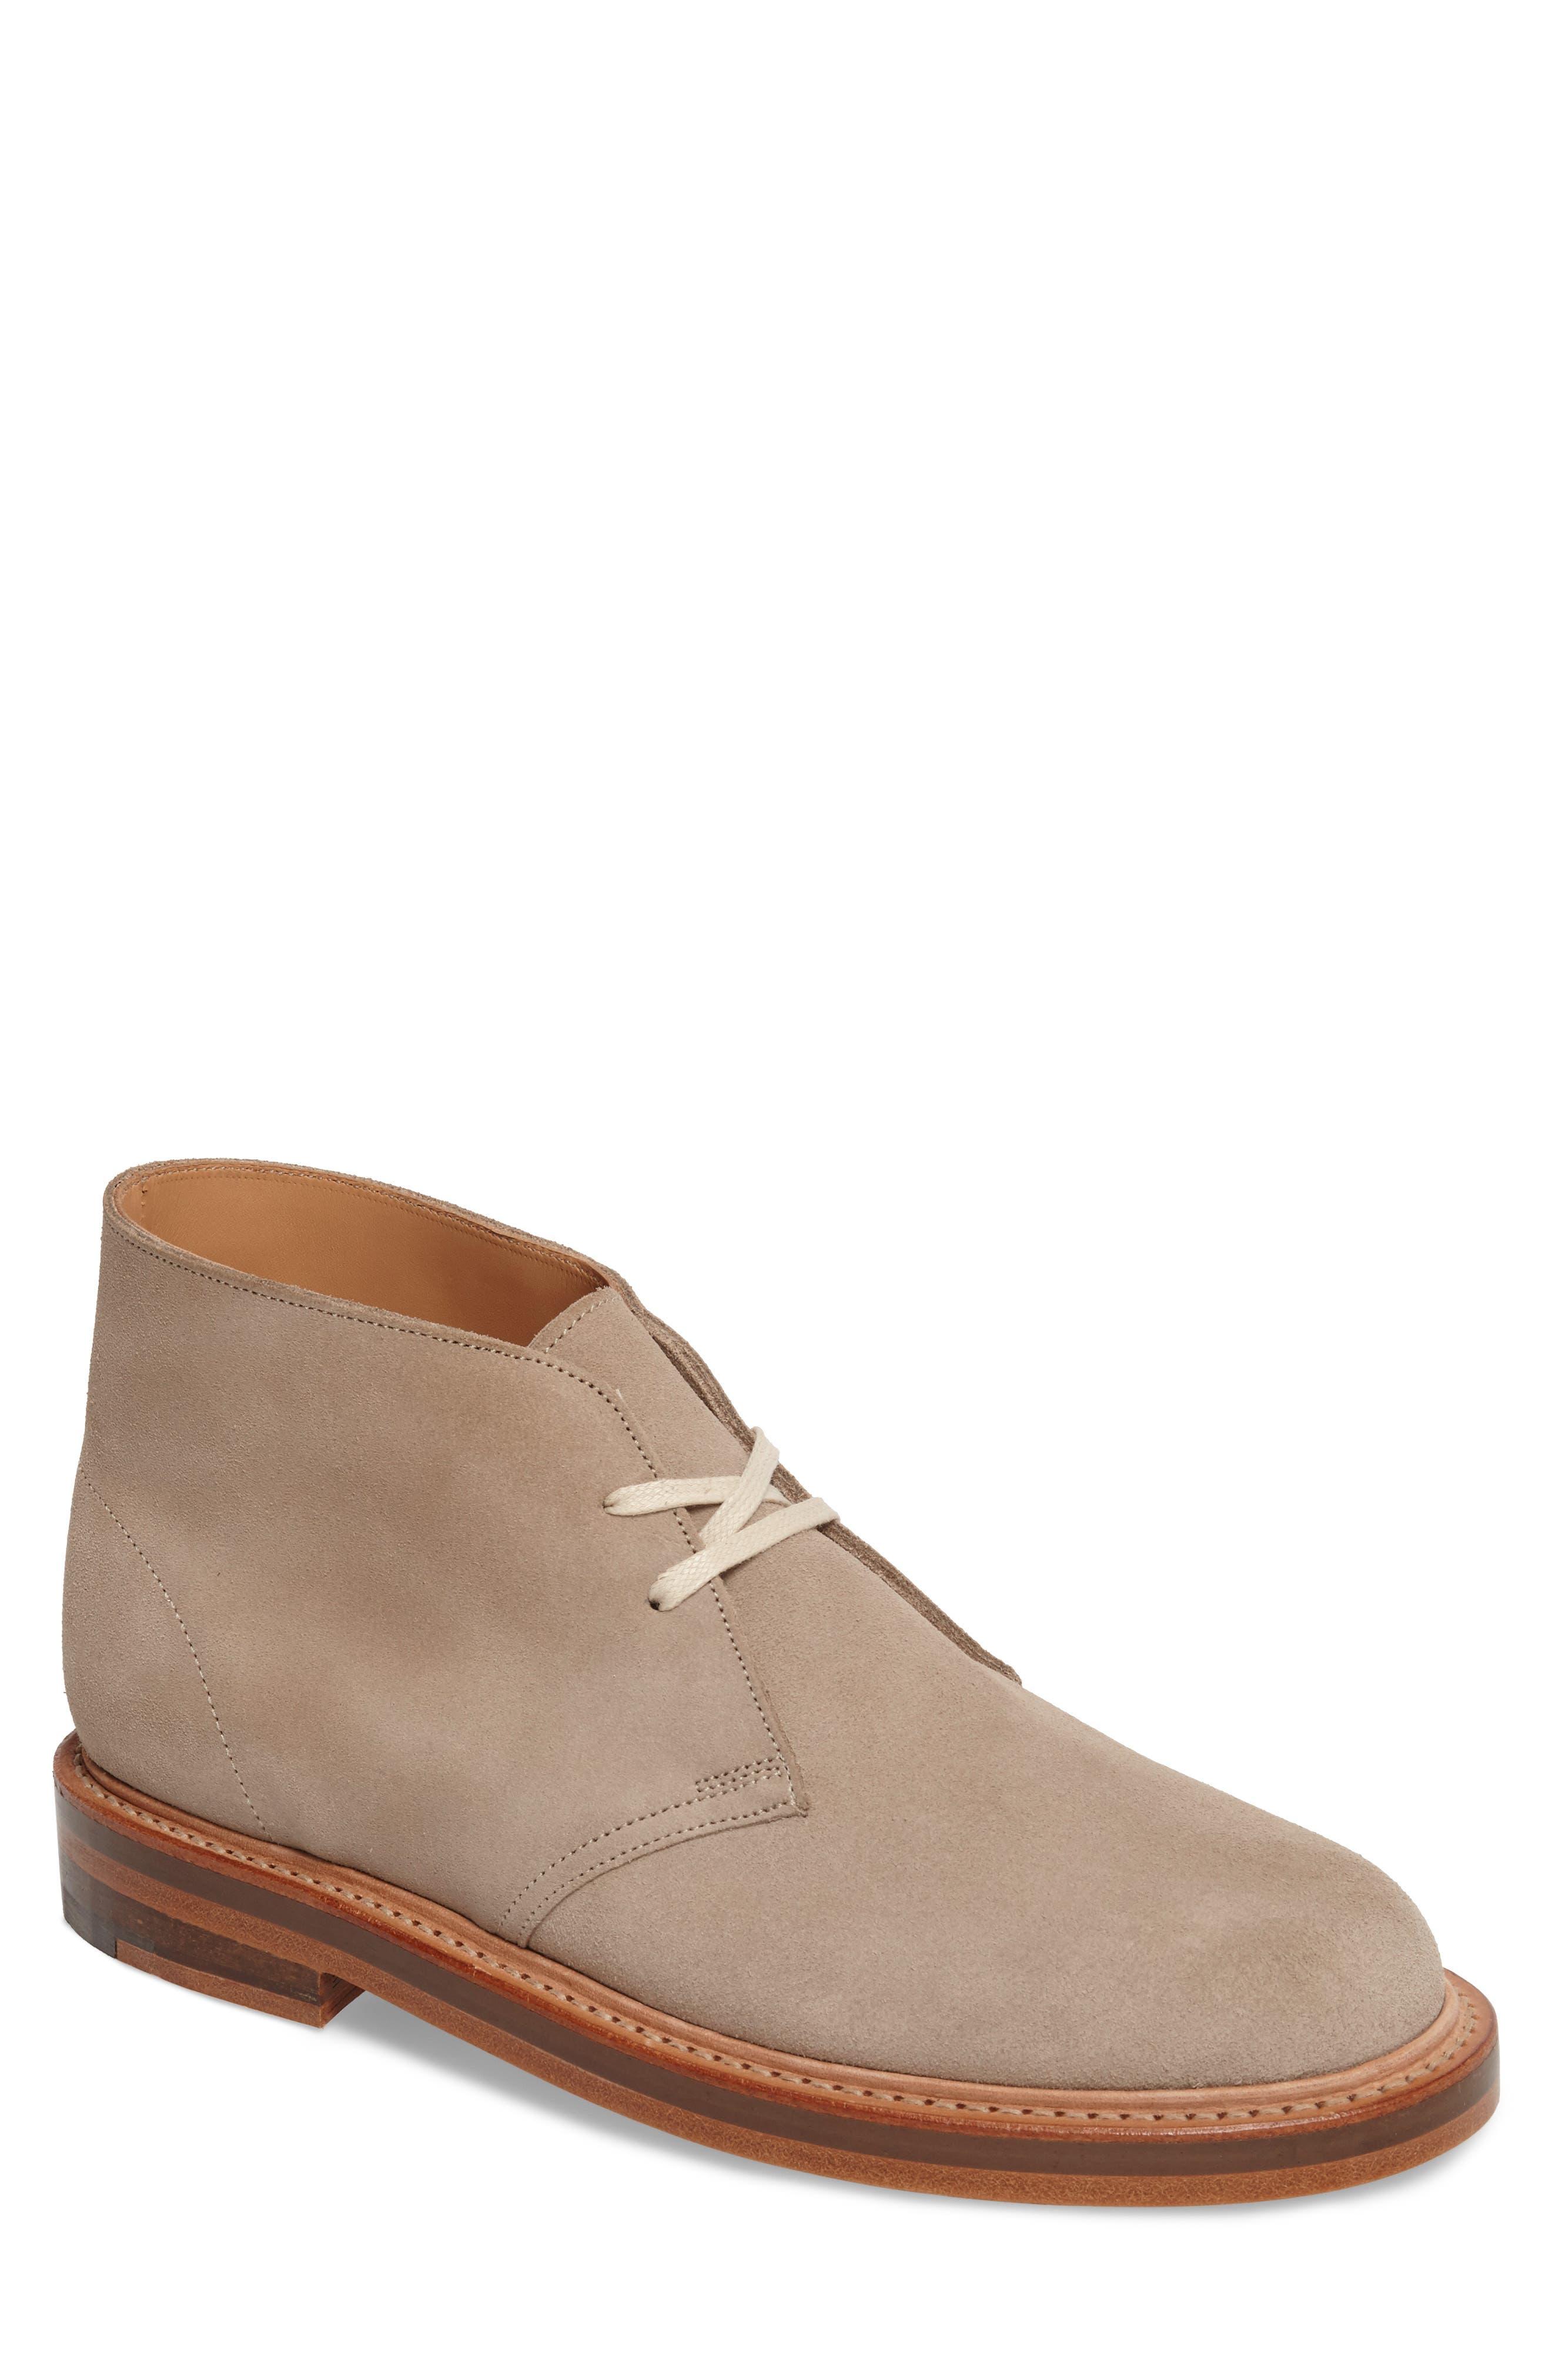 Clarks Desert Chukka Boot,                         Main,                         color, SAND SUEDE